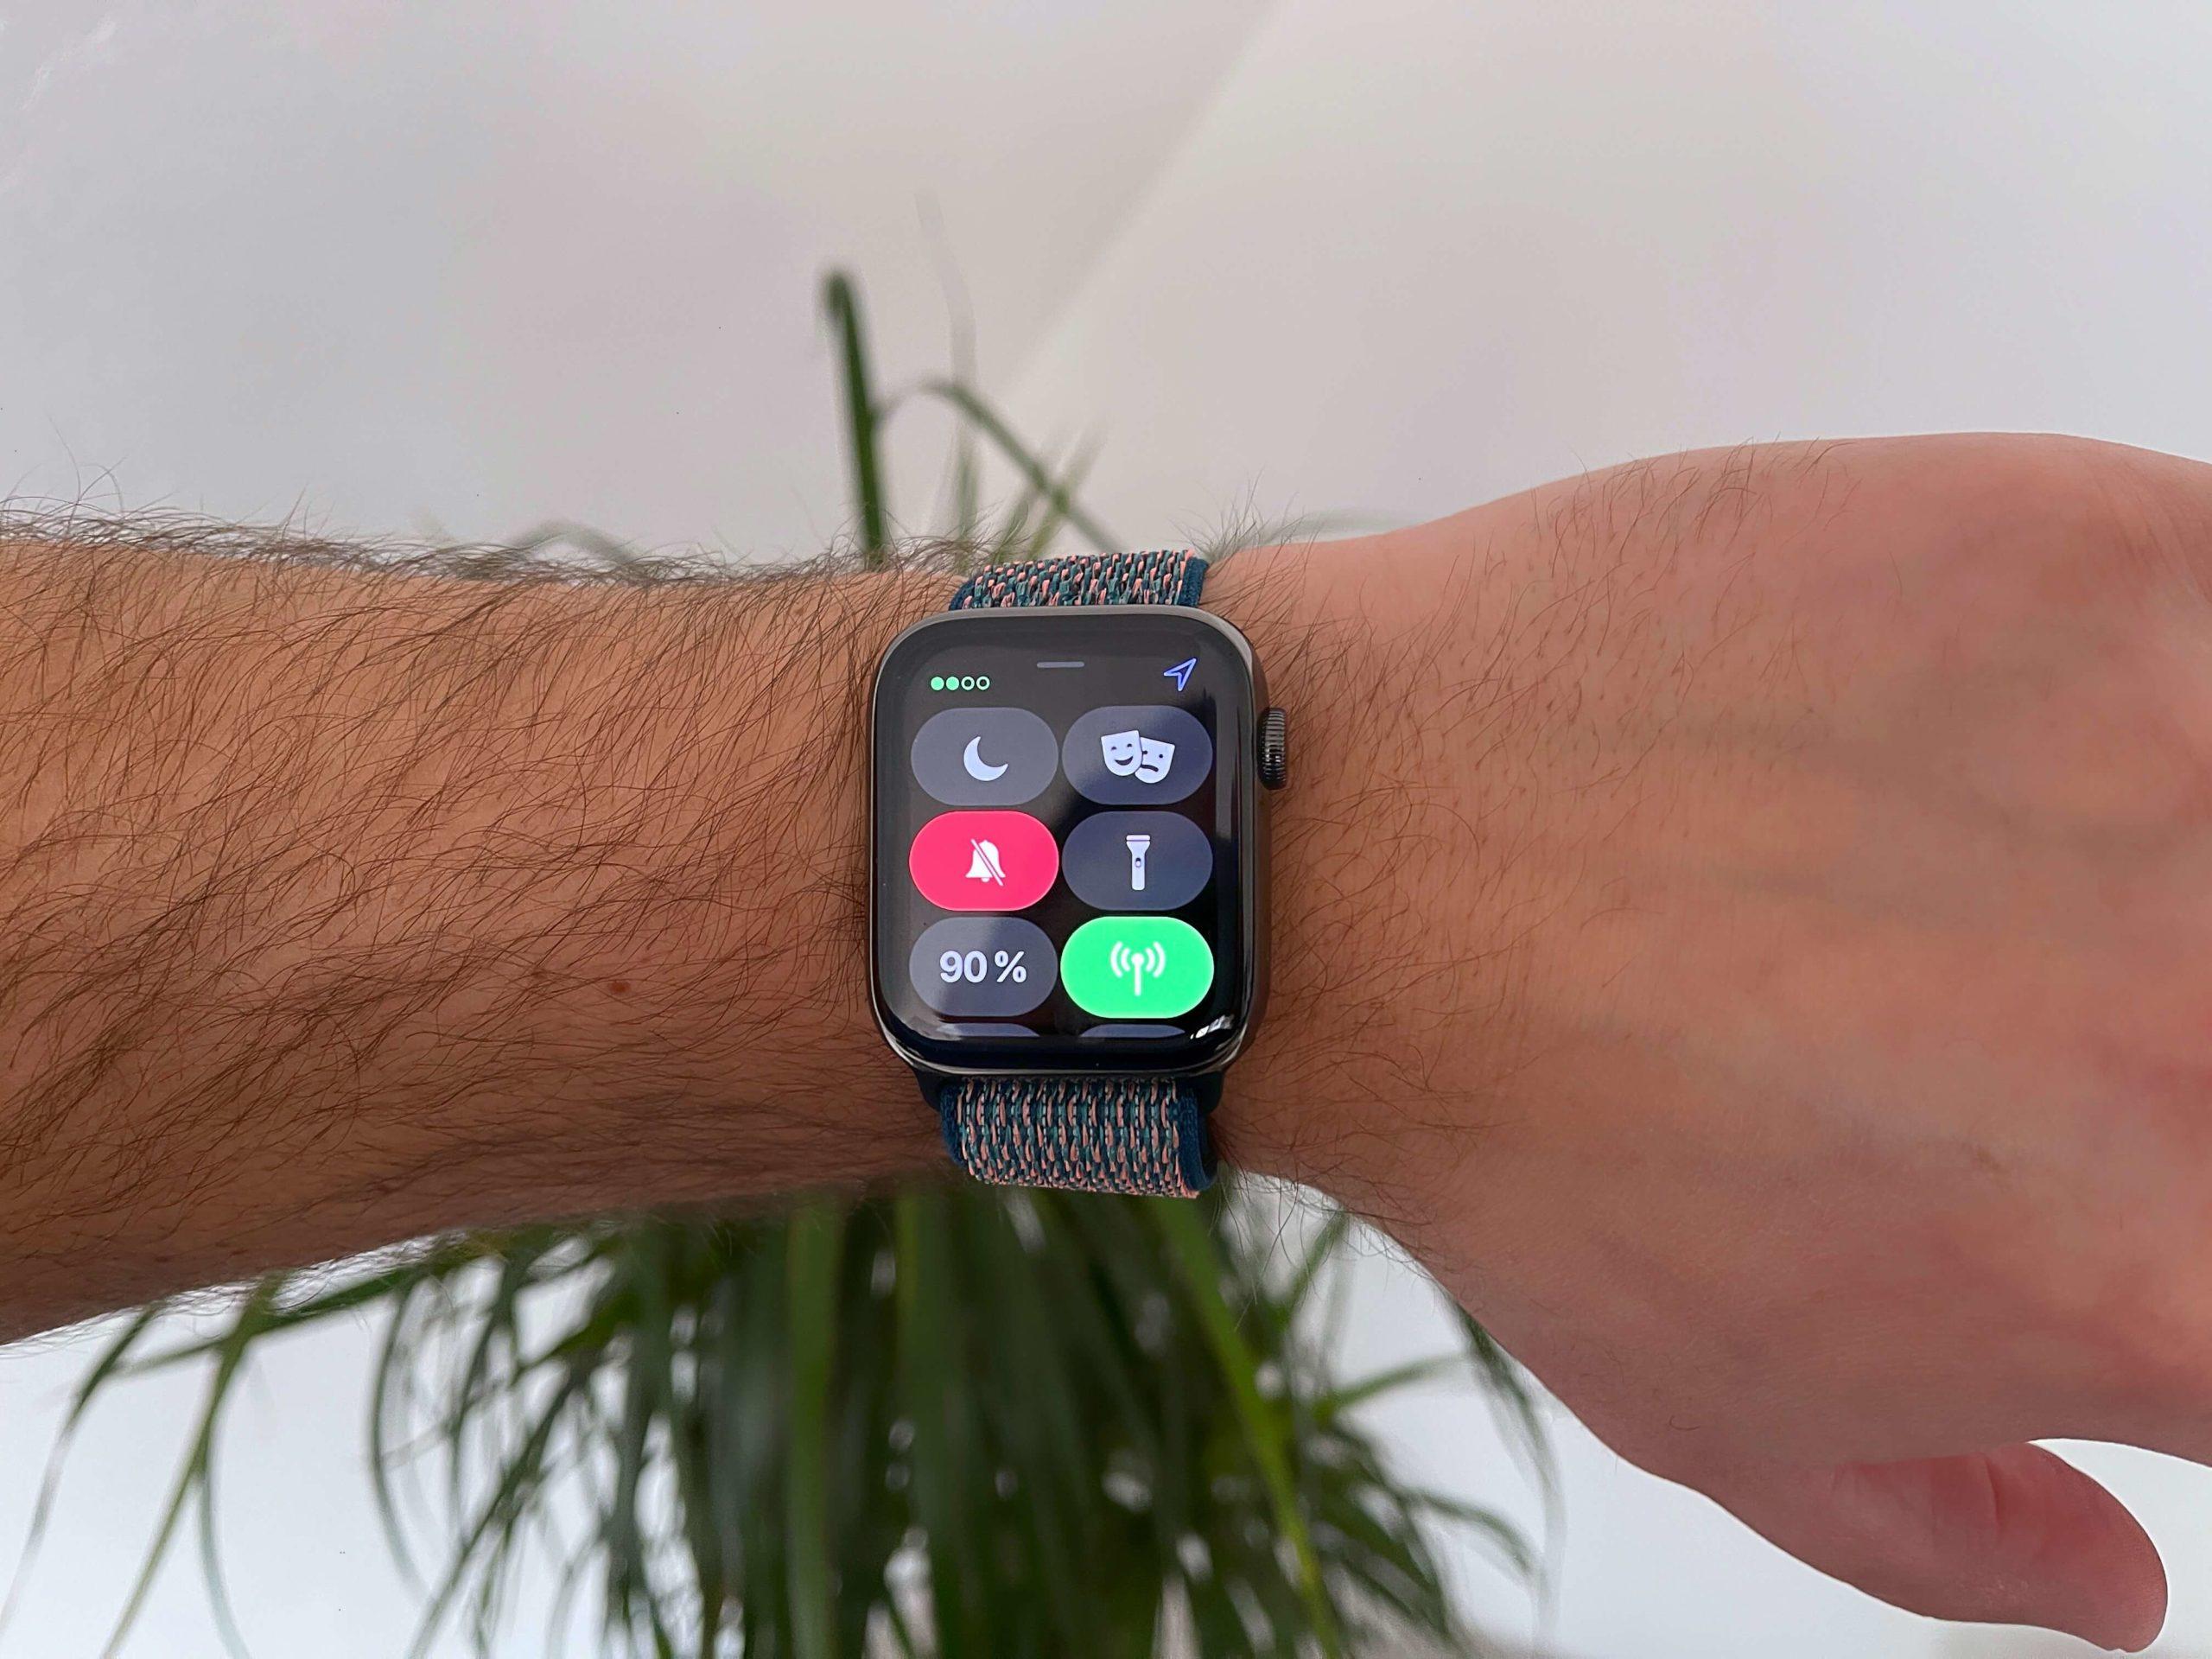 Mobilfunk-in-der-Apple-Watch-Sinn-Unsinn-scaled Mobilfunk in der Apple Watch: Sinn? Unsinn?